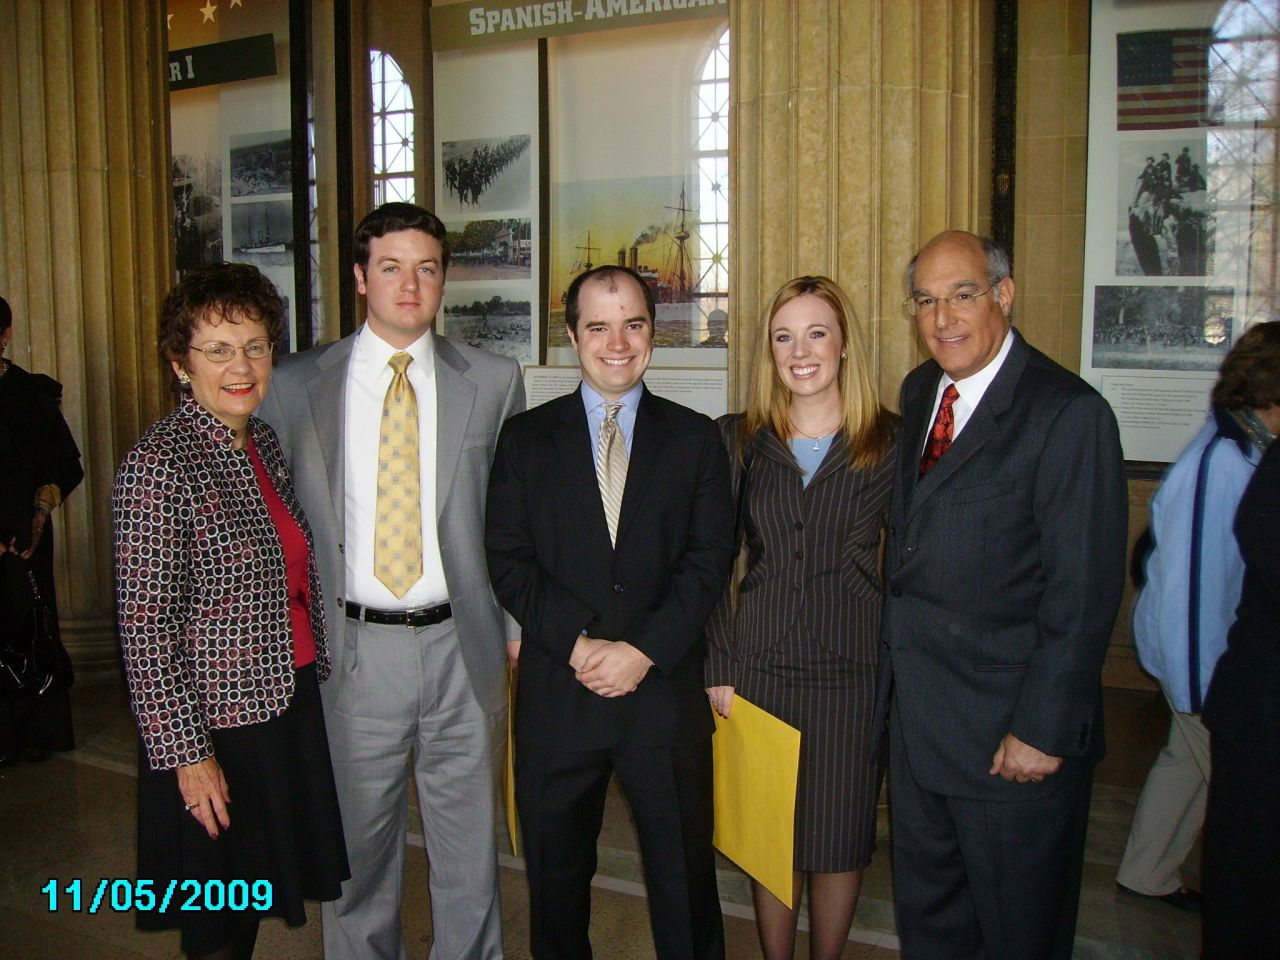 Justice Garman, Kevin Markes, Patrick Schuette, Michelle Clatfelter, ISBA President Elect Mark Hassakis